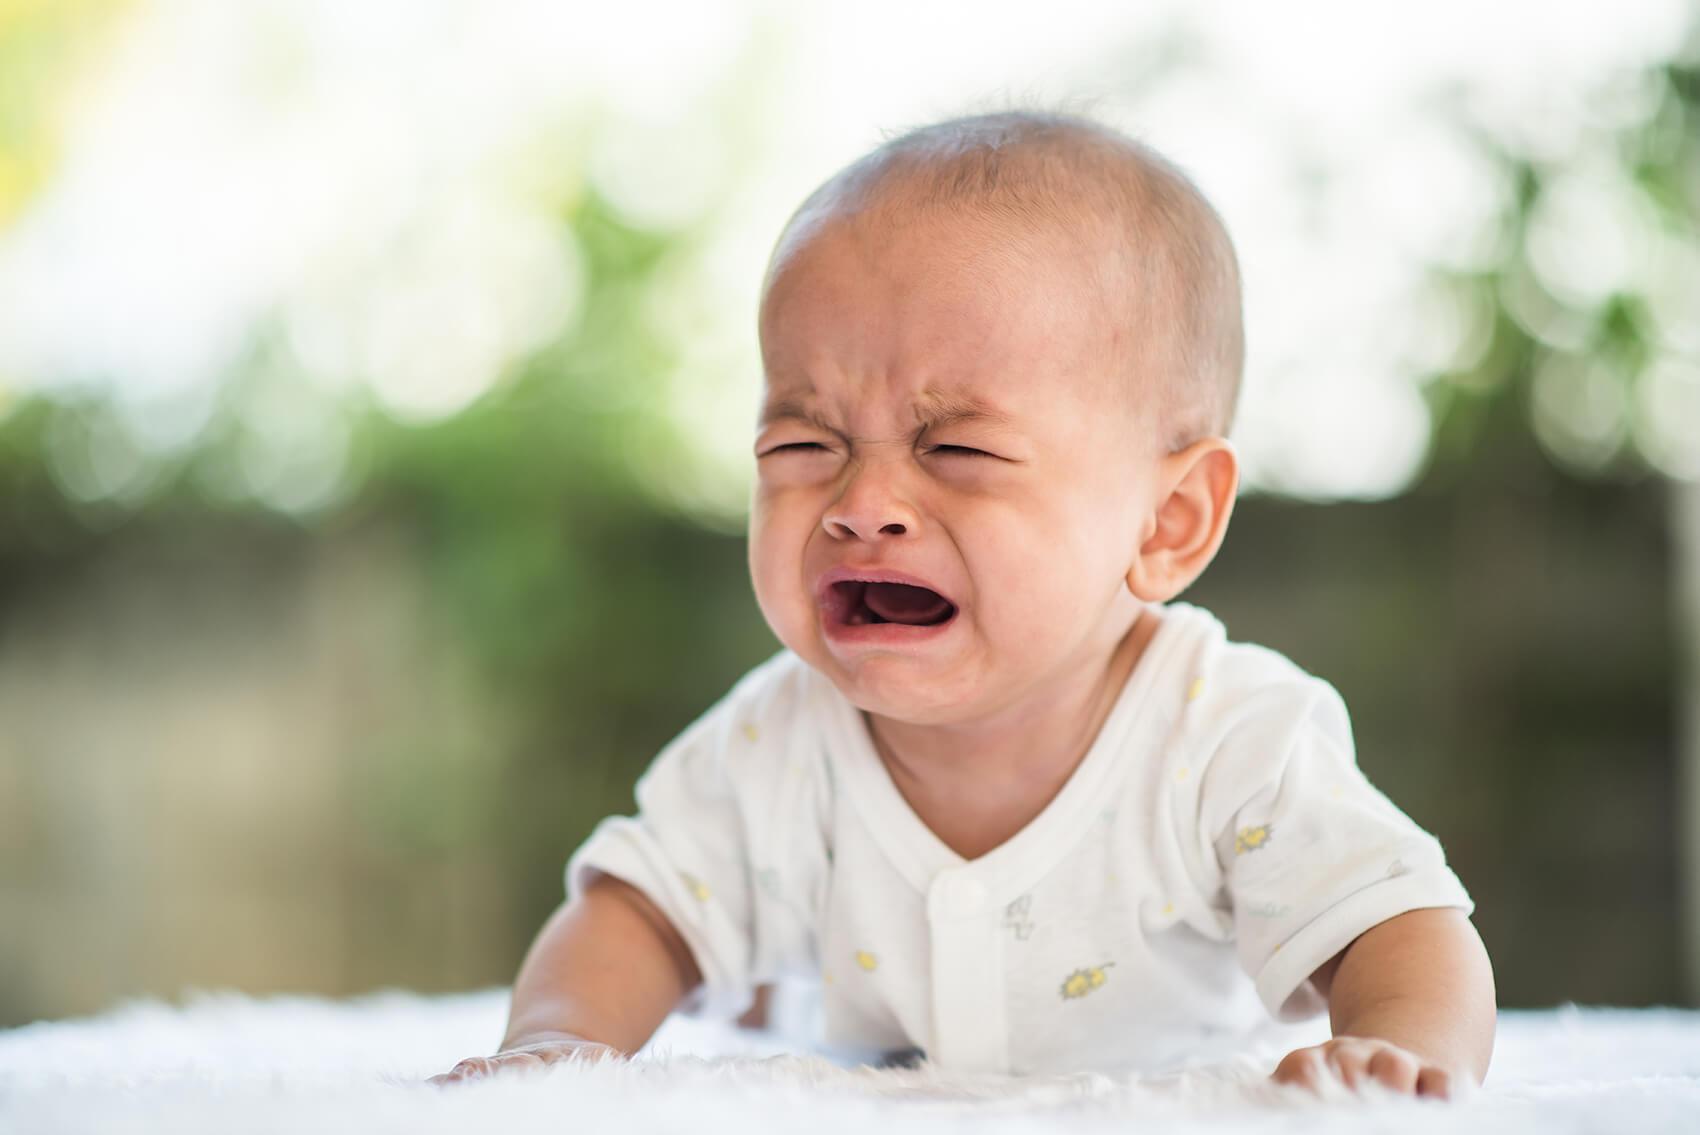 Ko dojenček joka